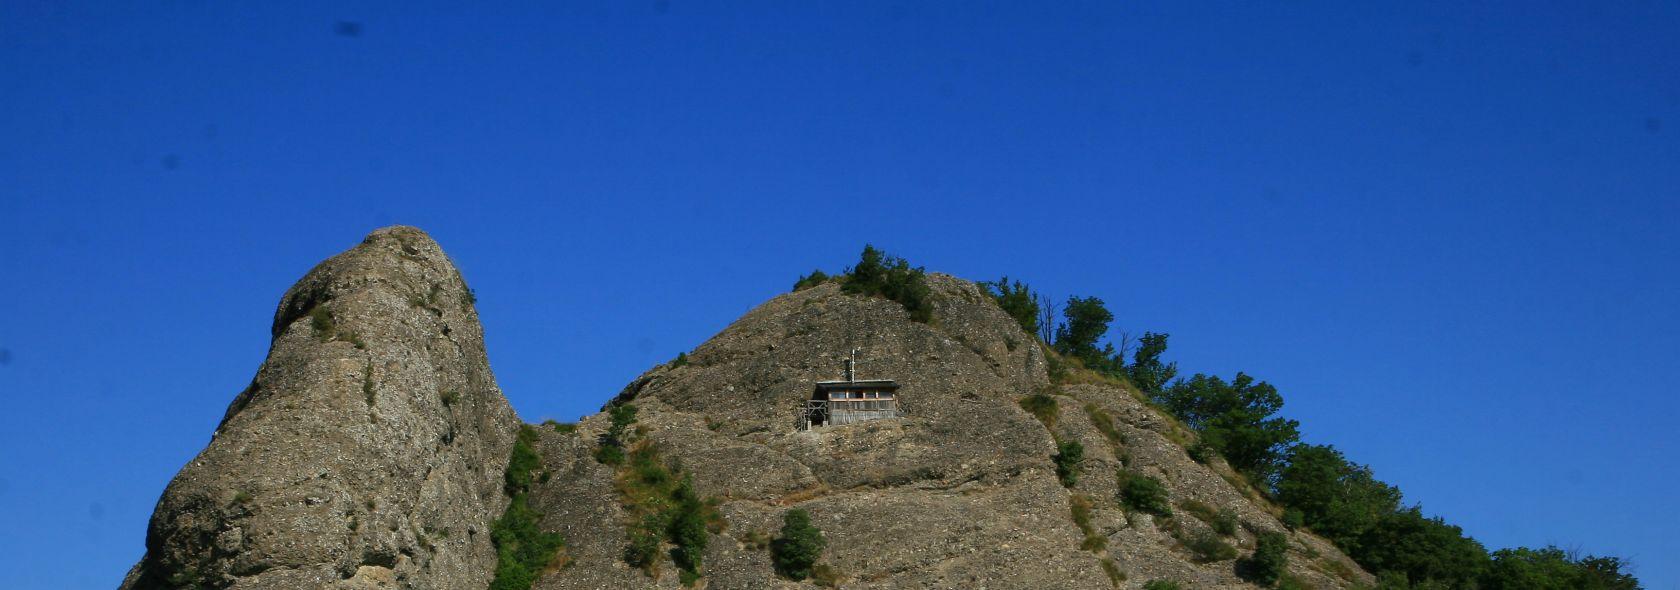 Rocche del Reopasso archivio Parco Antola